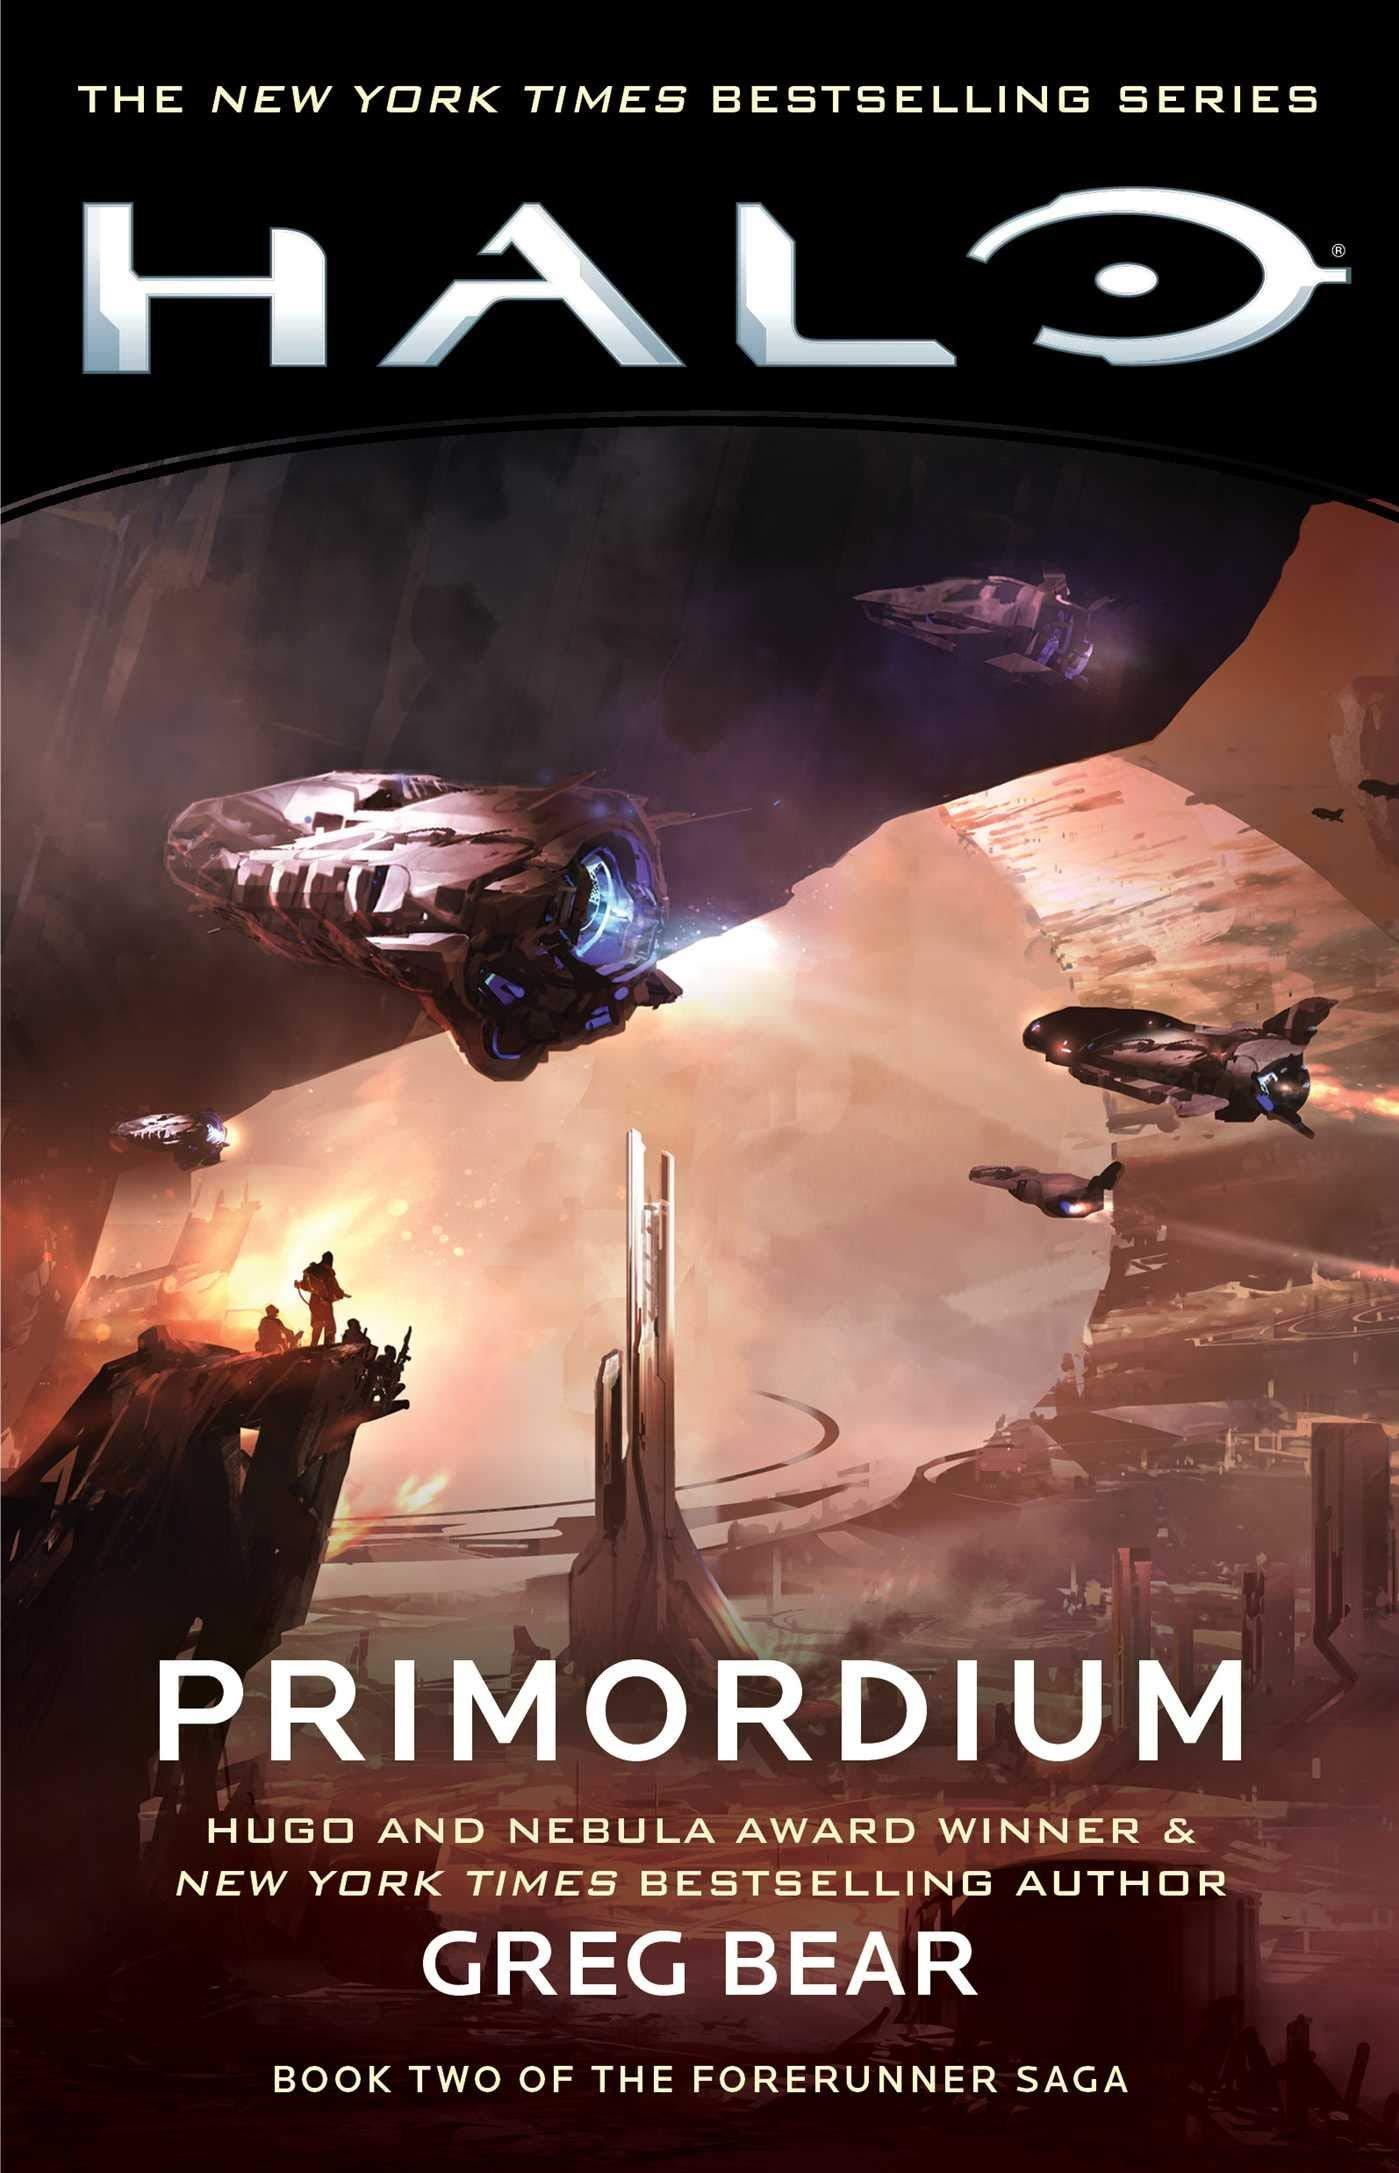 Halo: Primordium (Book Two of the Forerunner Saga)